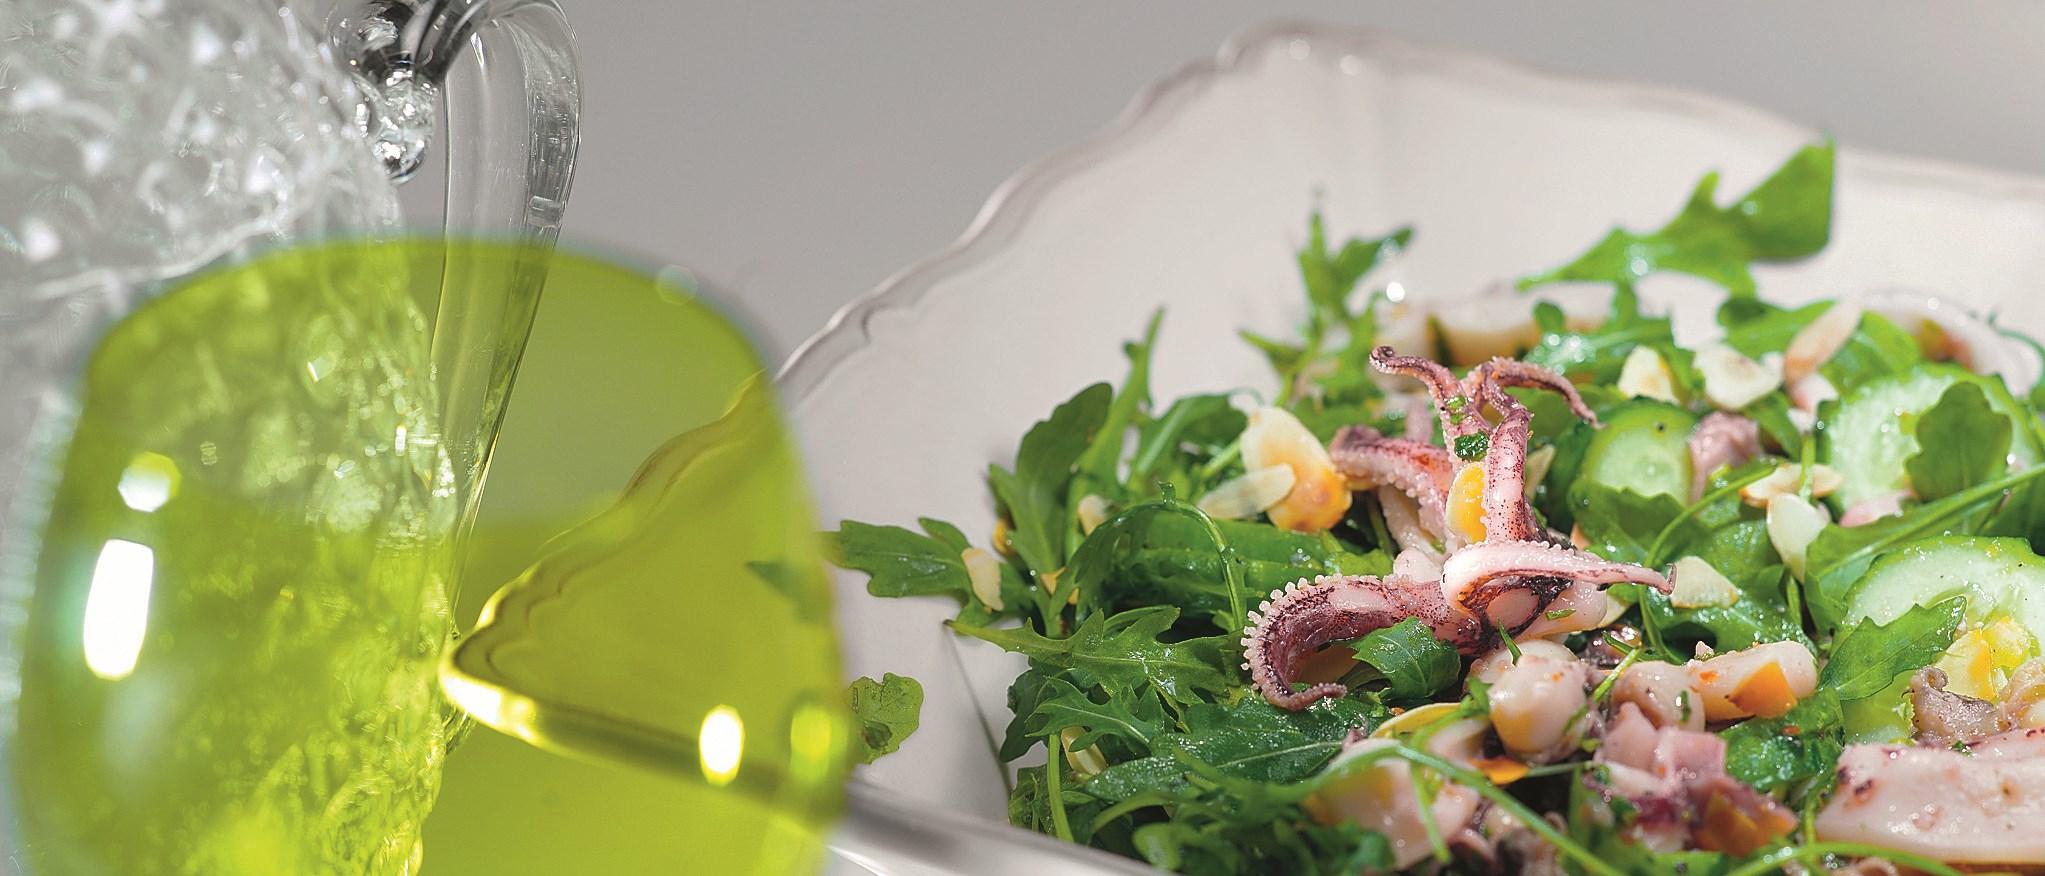 Салат с морскими гадами рецепт с